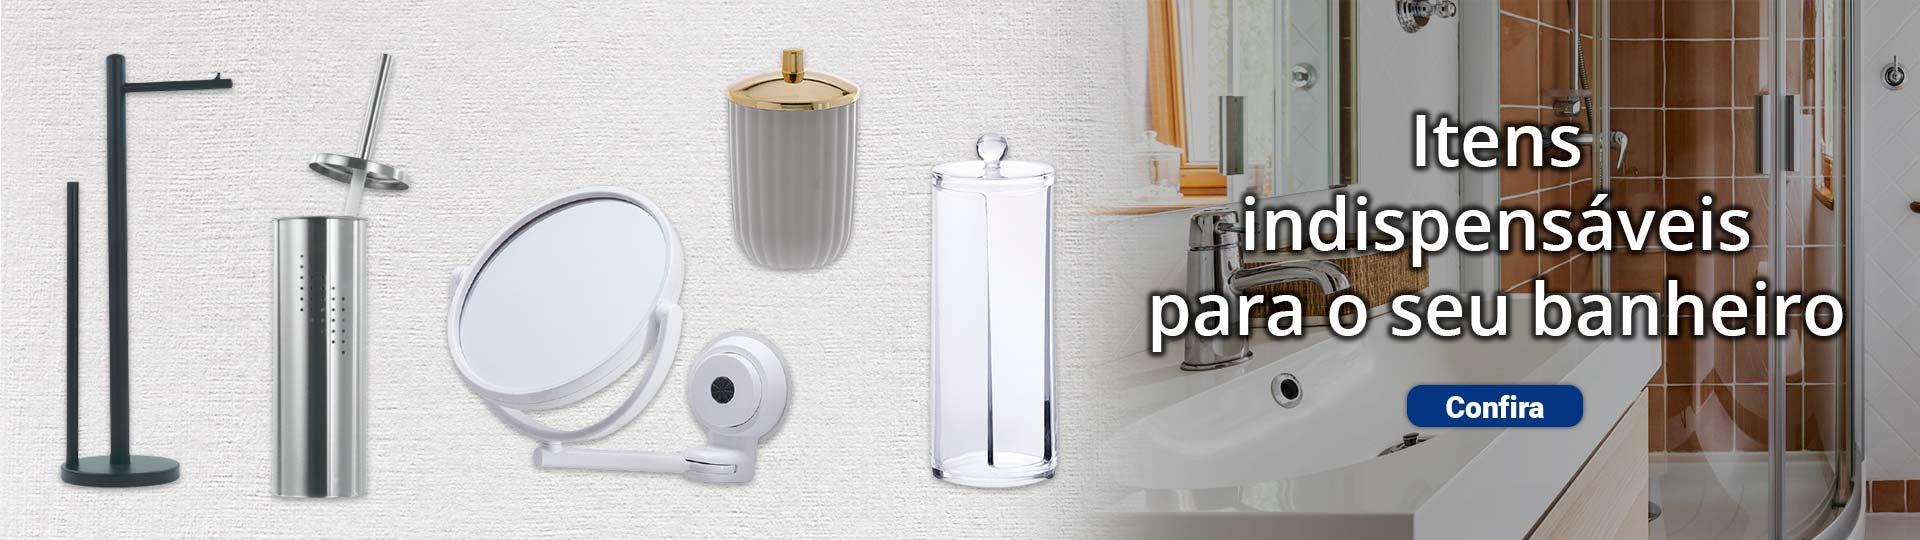 Banheiro - Full